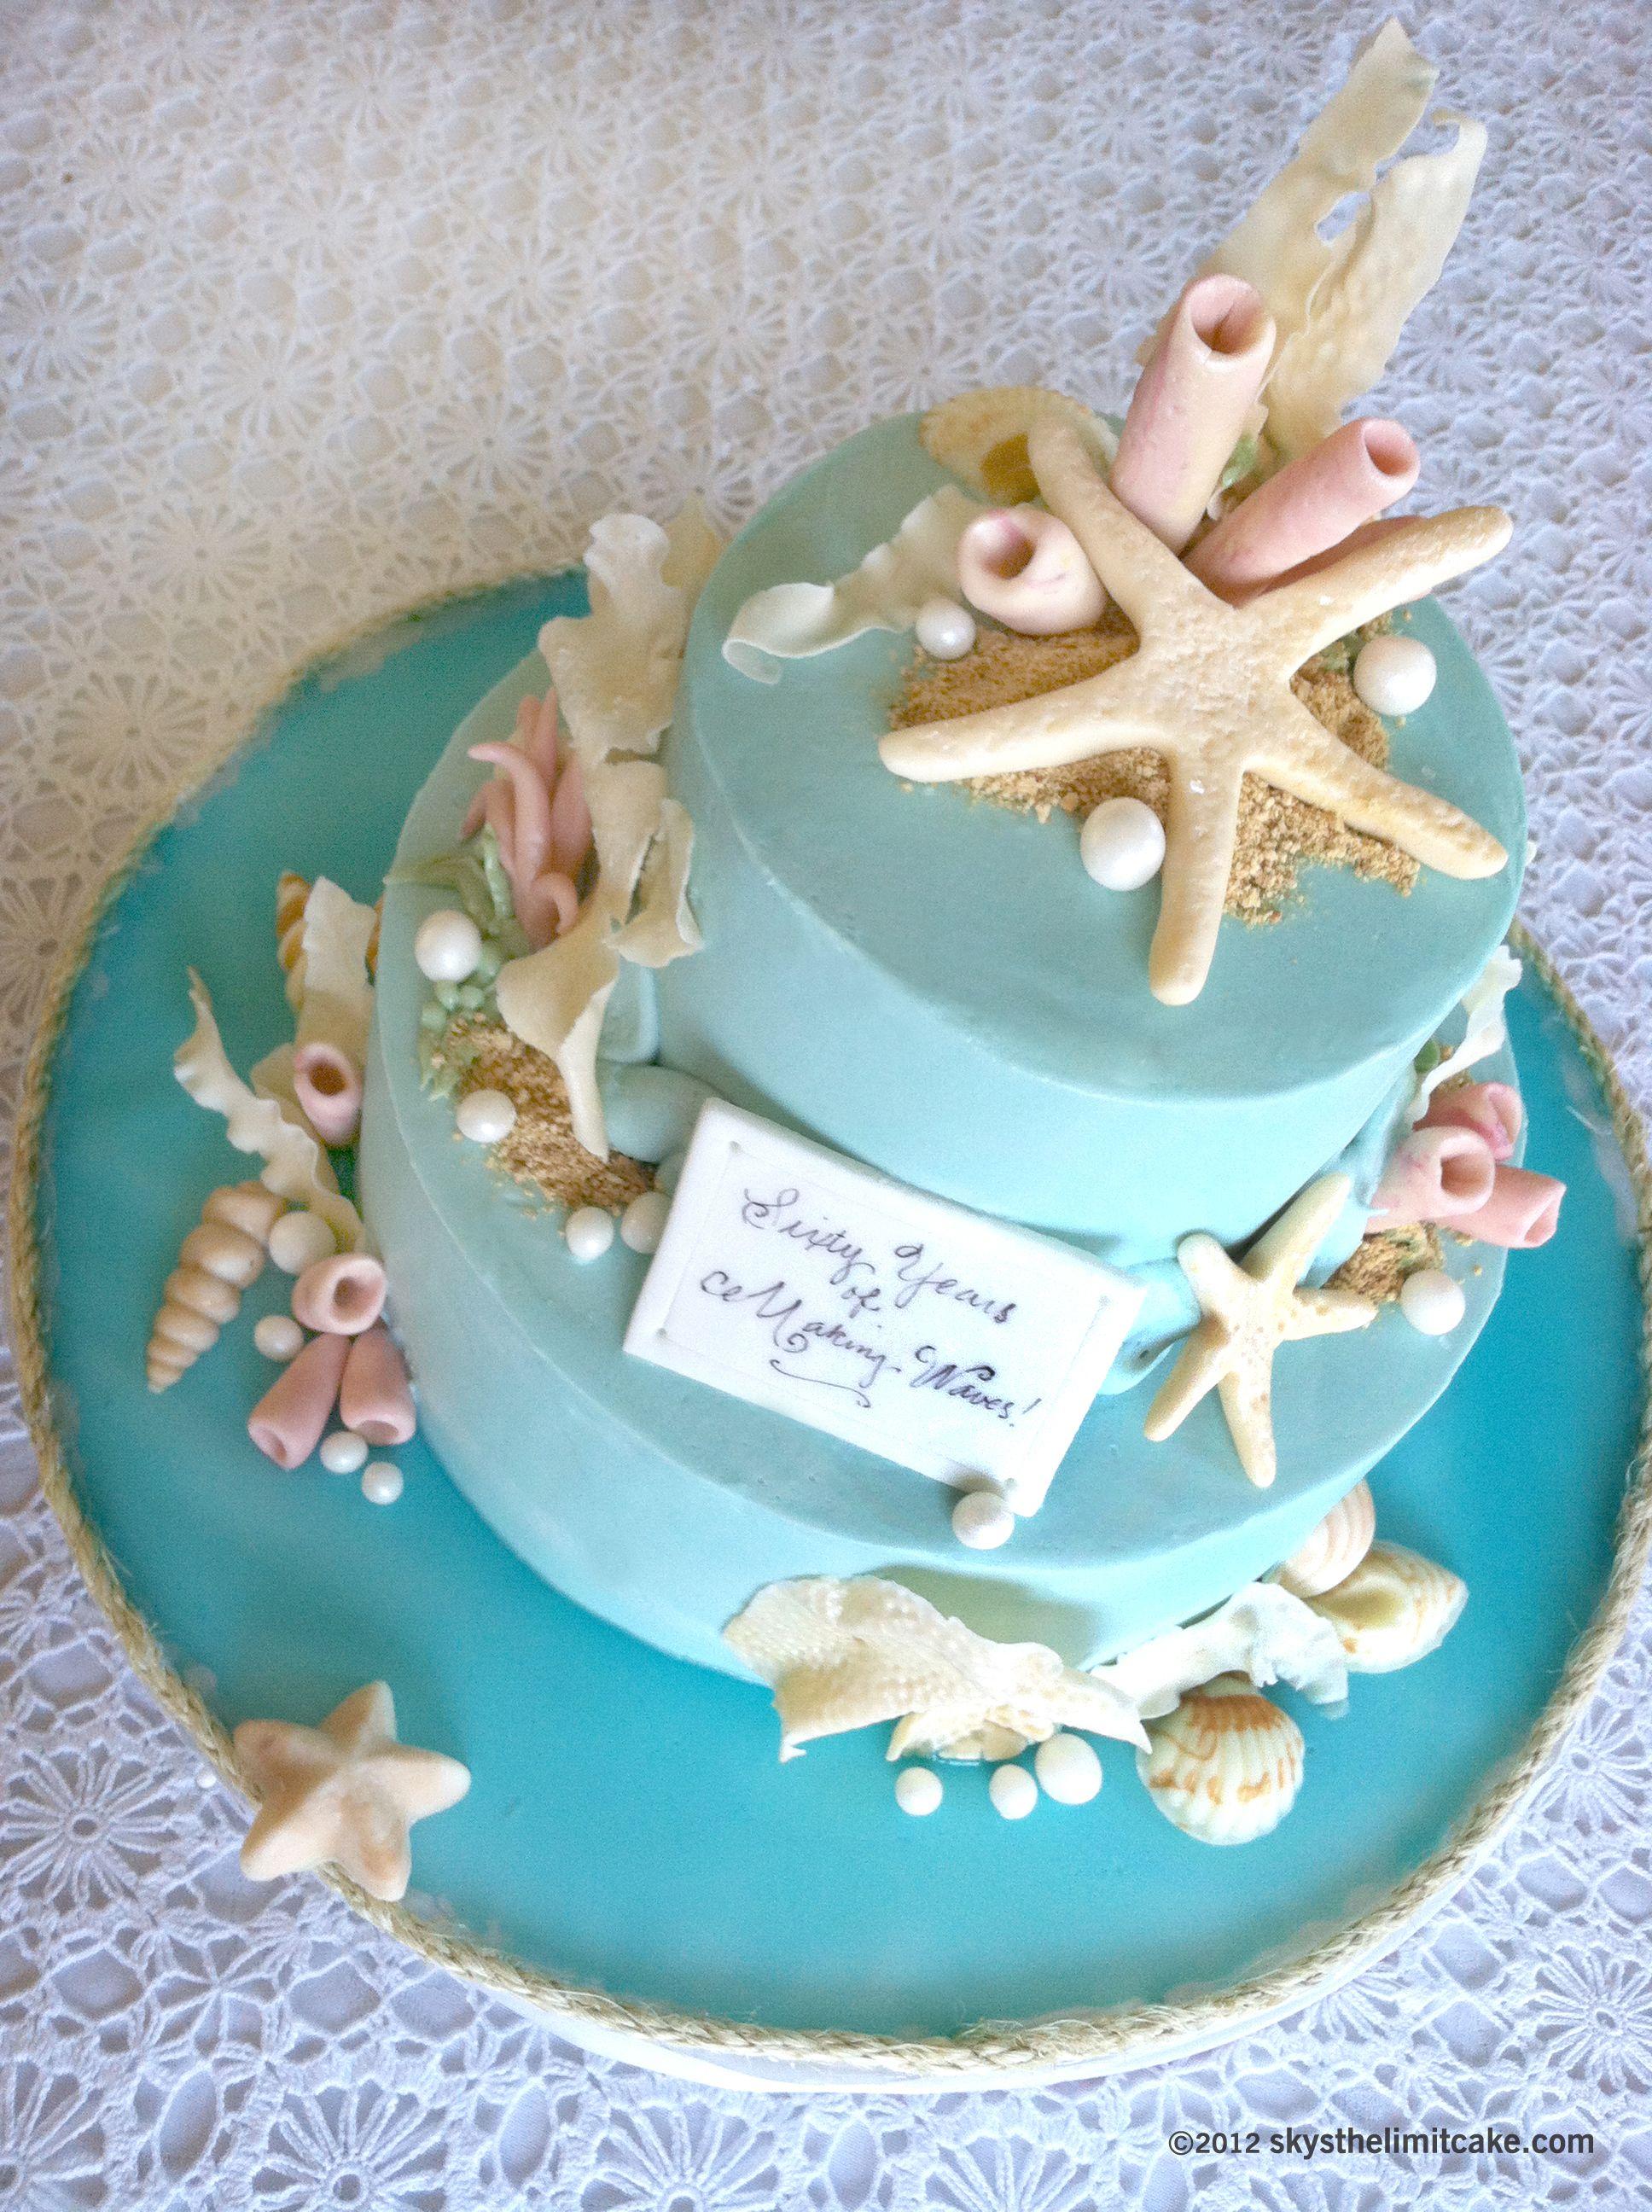 A Seaside Custom Birthday Cake for a very special lady ...